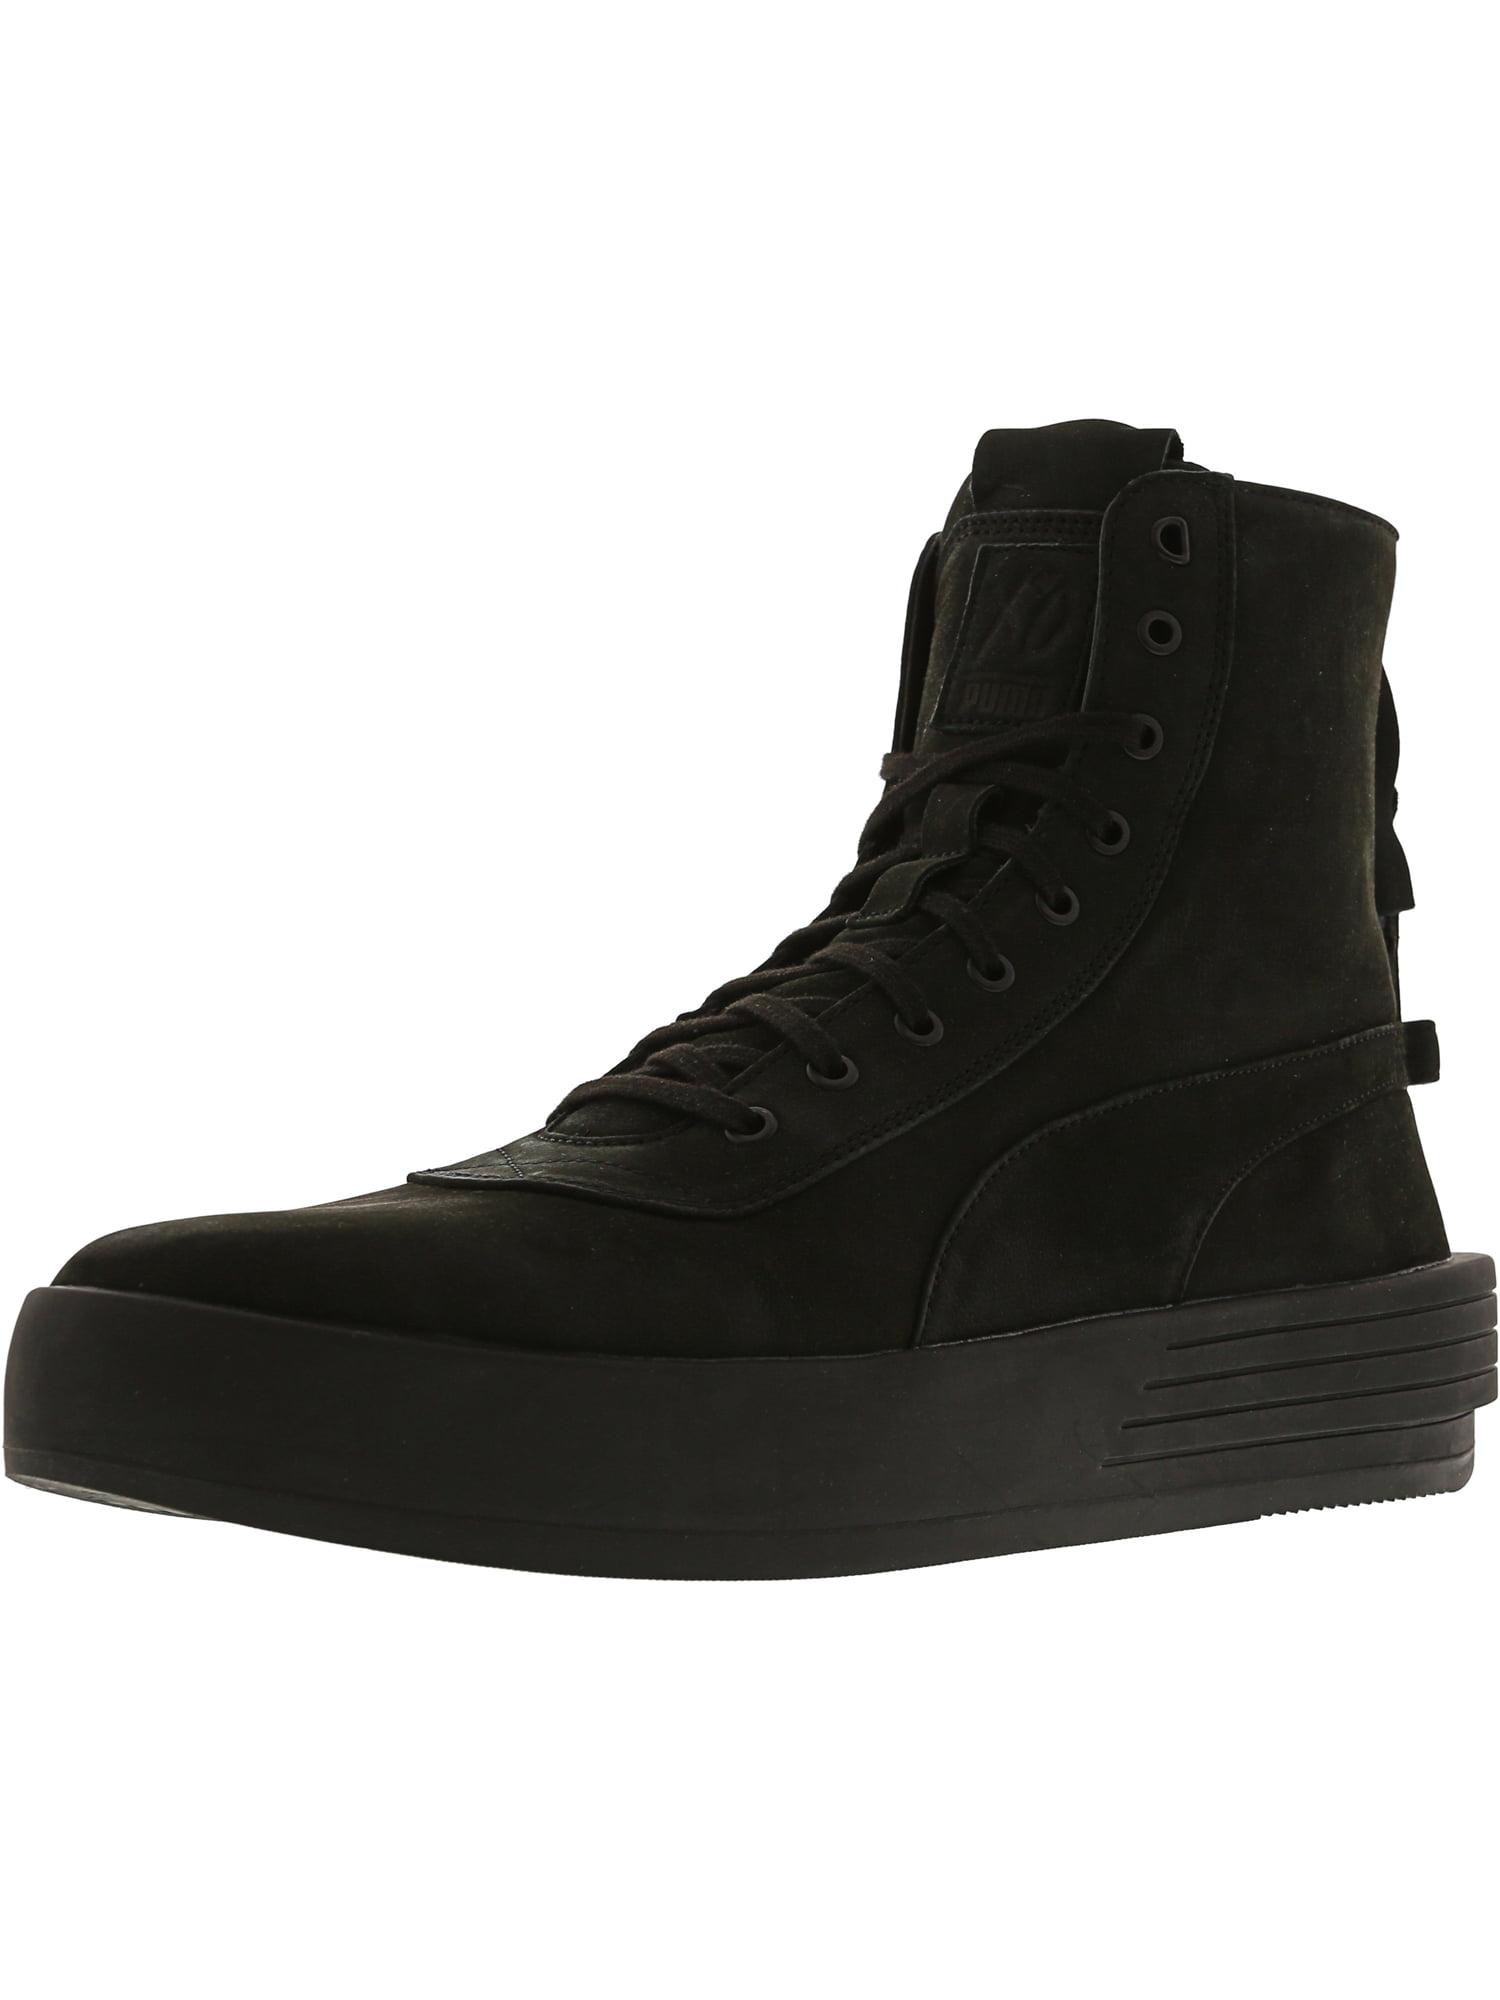 Puma Men's Xo Parallel Black / High-Top Leather Fashion Sneaker - 10M